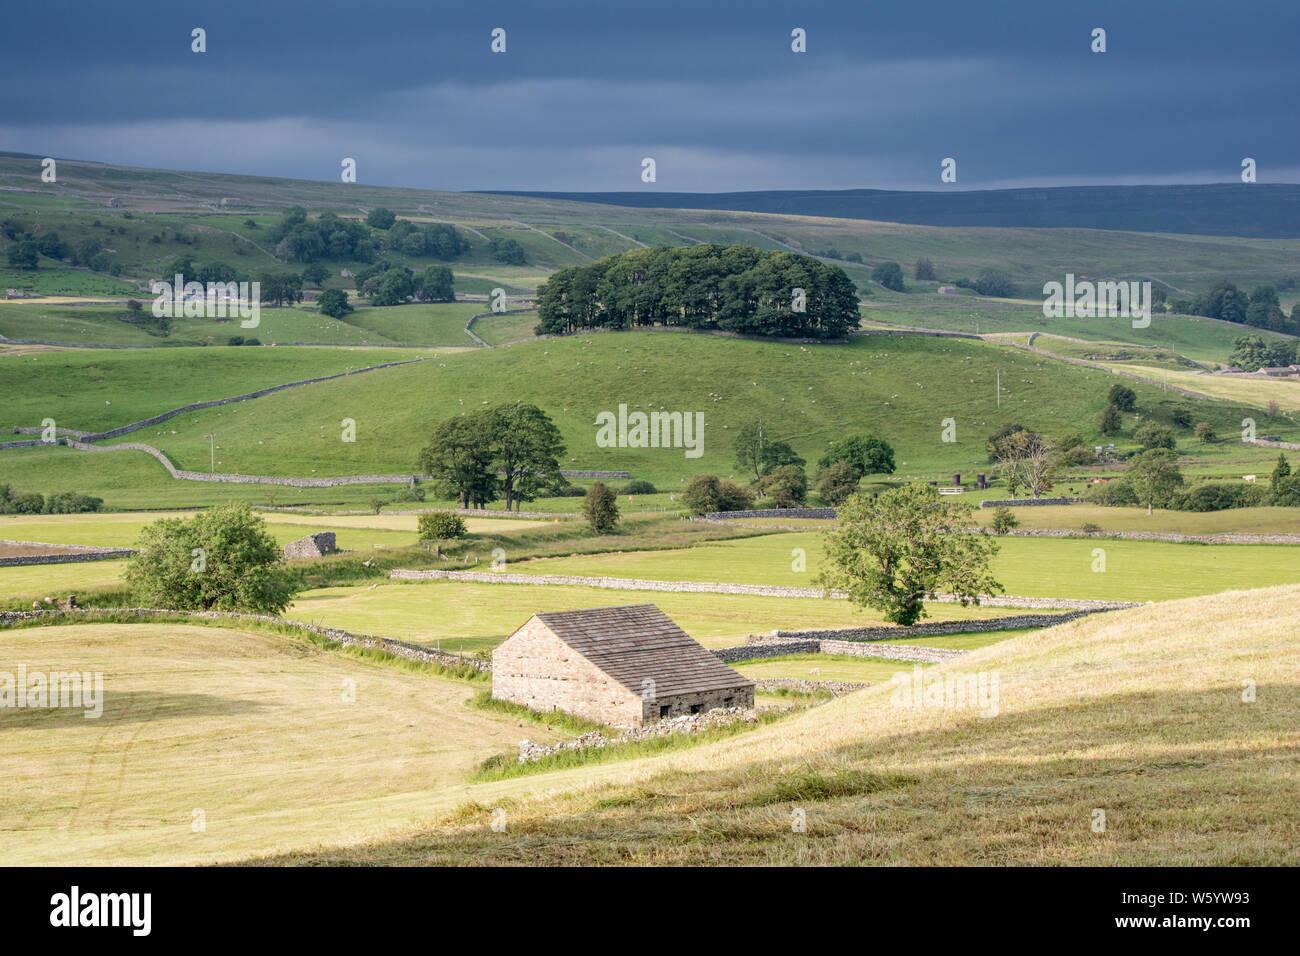 Wensleydale landscape, Yorkshire Dales National Park, North Yorkshire, England, UK Stock Photo